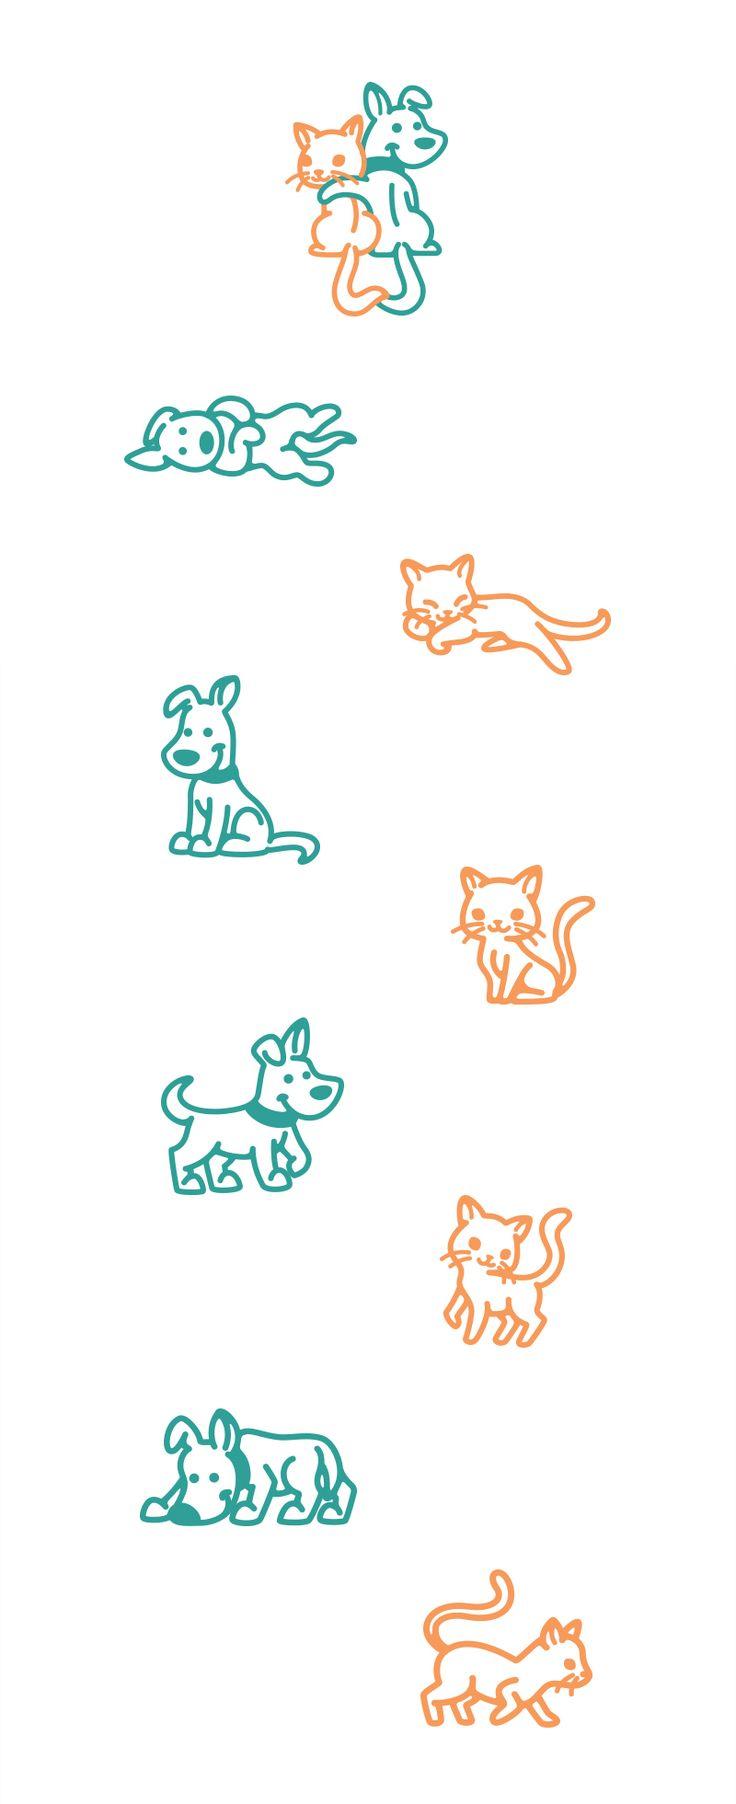 Dog&Cat #dog #cat #dogs #cats #puppy #cute #logo #illustration #icon #positions #poses #creative #vector #kreatank #designer